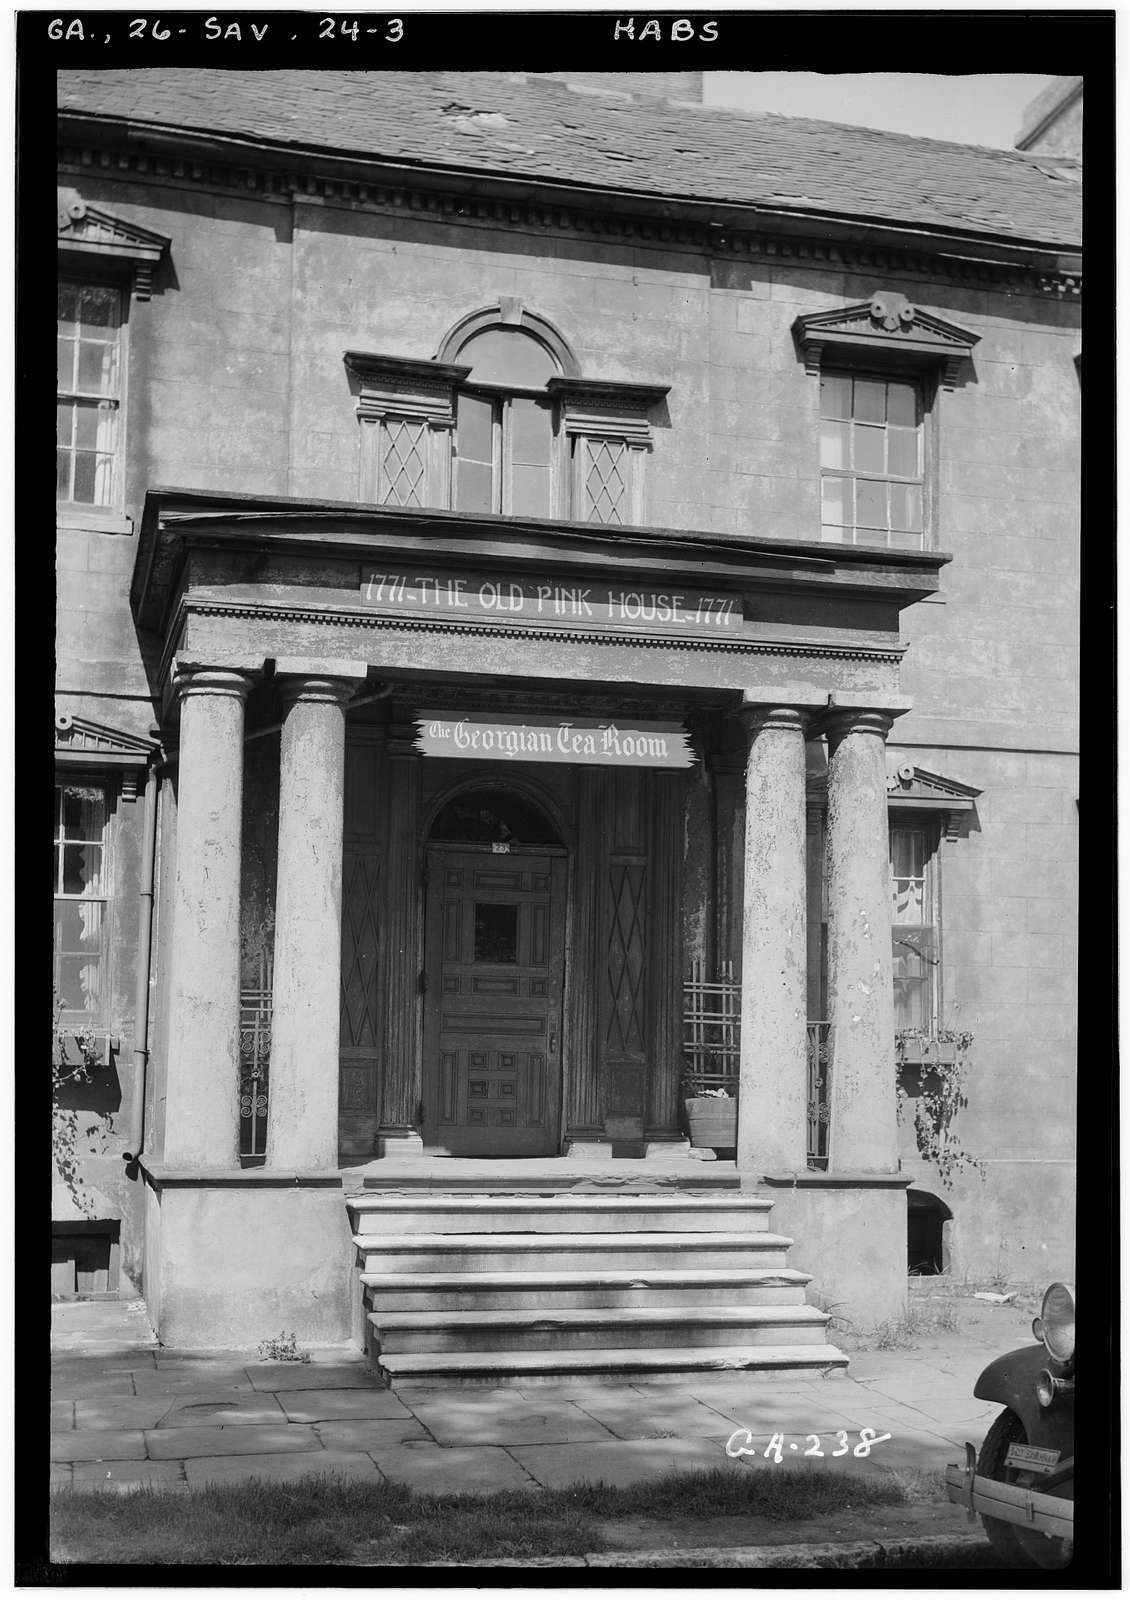 Habersham House, Reynolds Square Vicinity, Savannah, Chatham County, GA